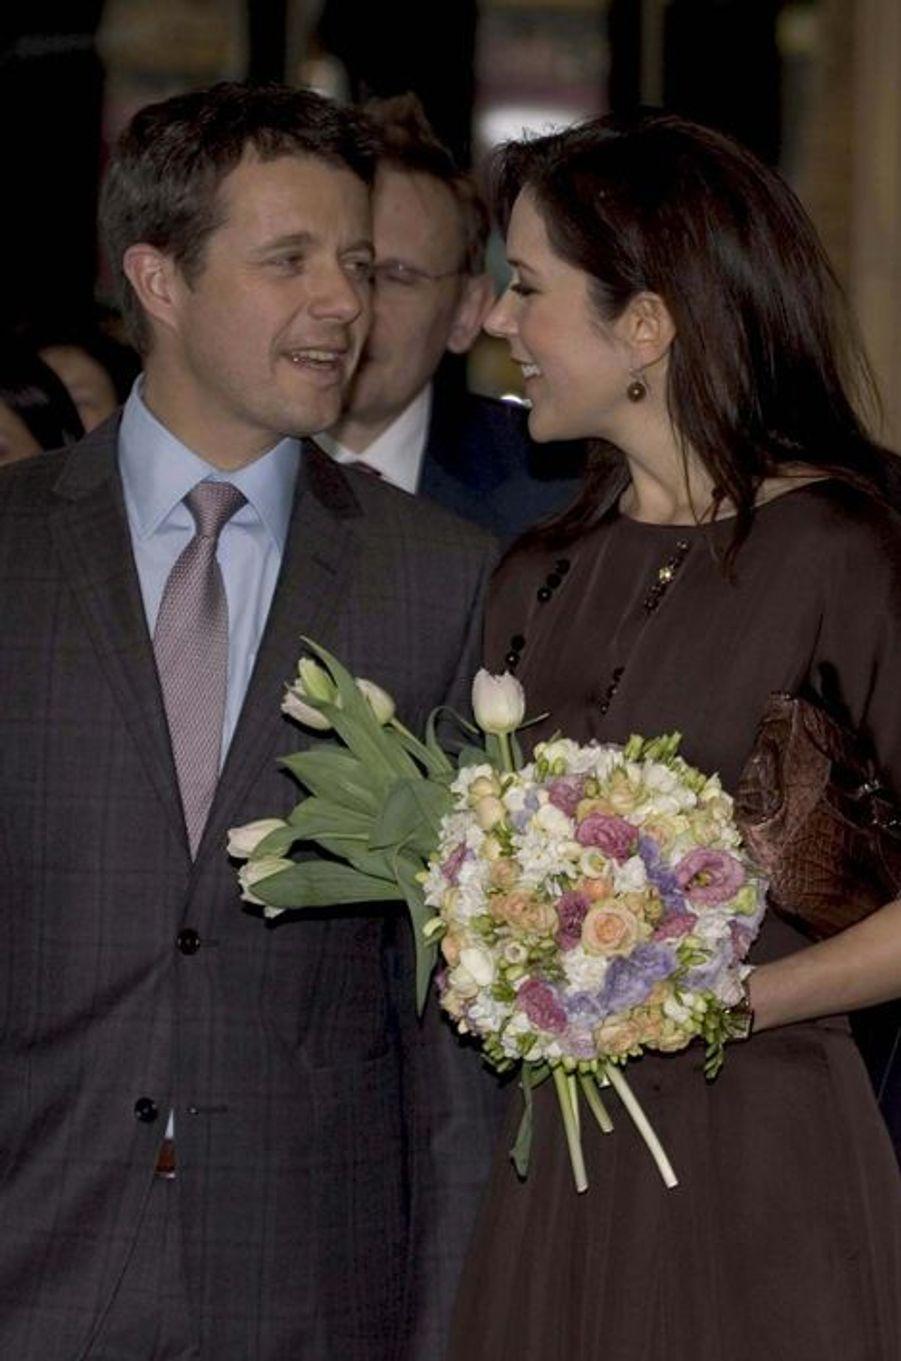 Mary et Frederik, le 19 mars 2010